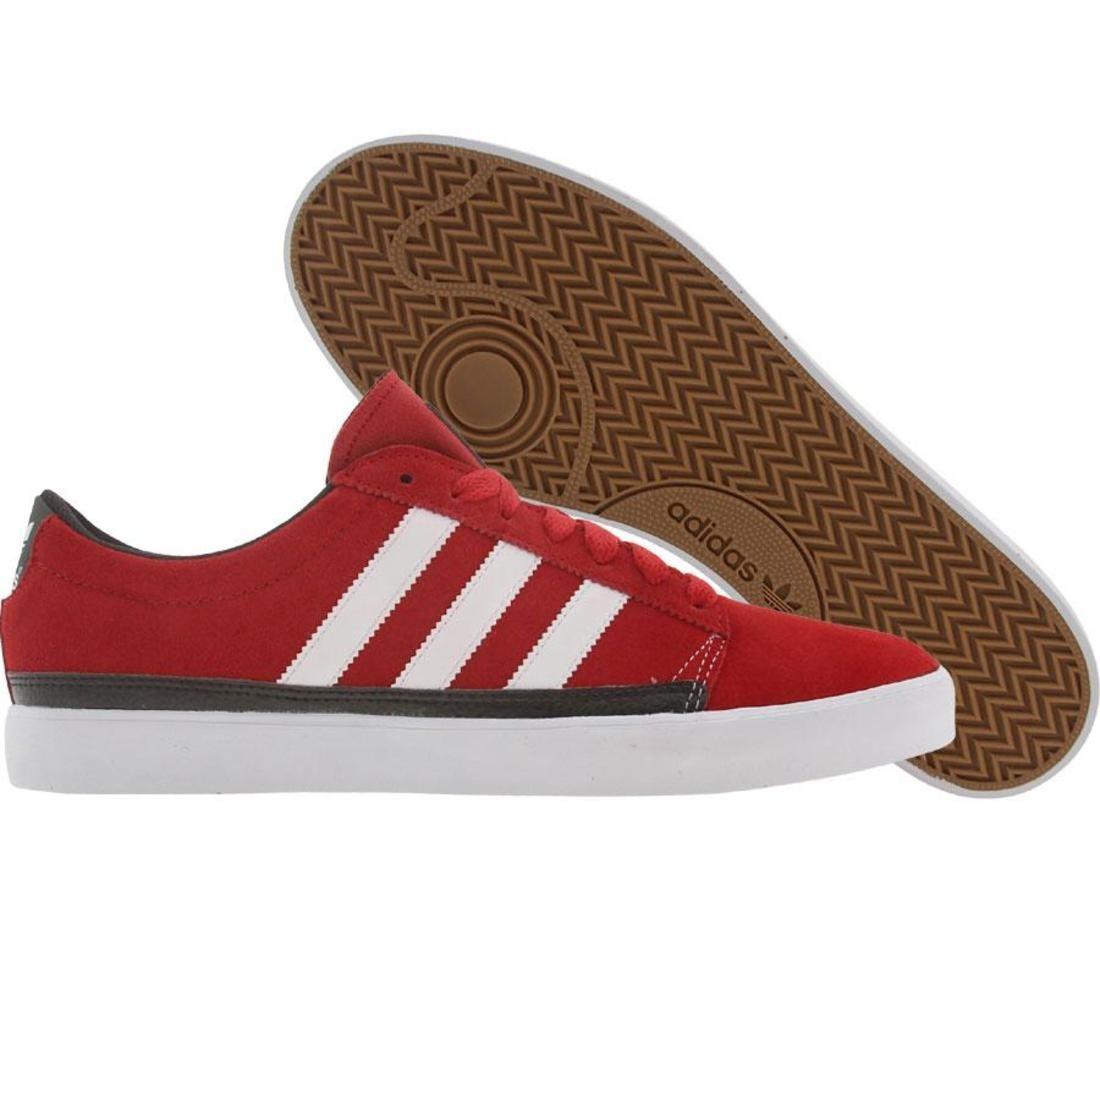 Adidas Skate Rayado Low (university red   runninwhite   black) e4ab48473